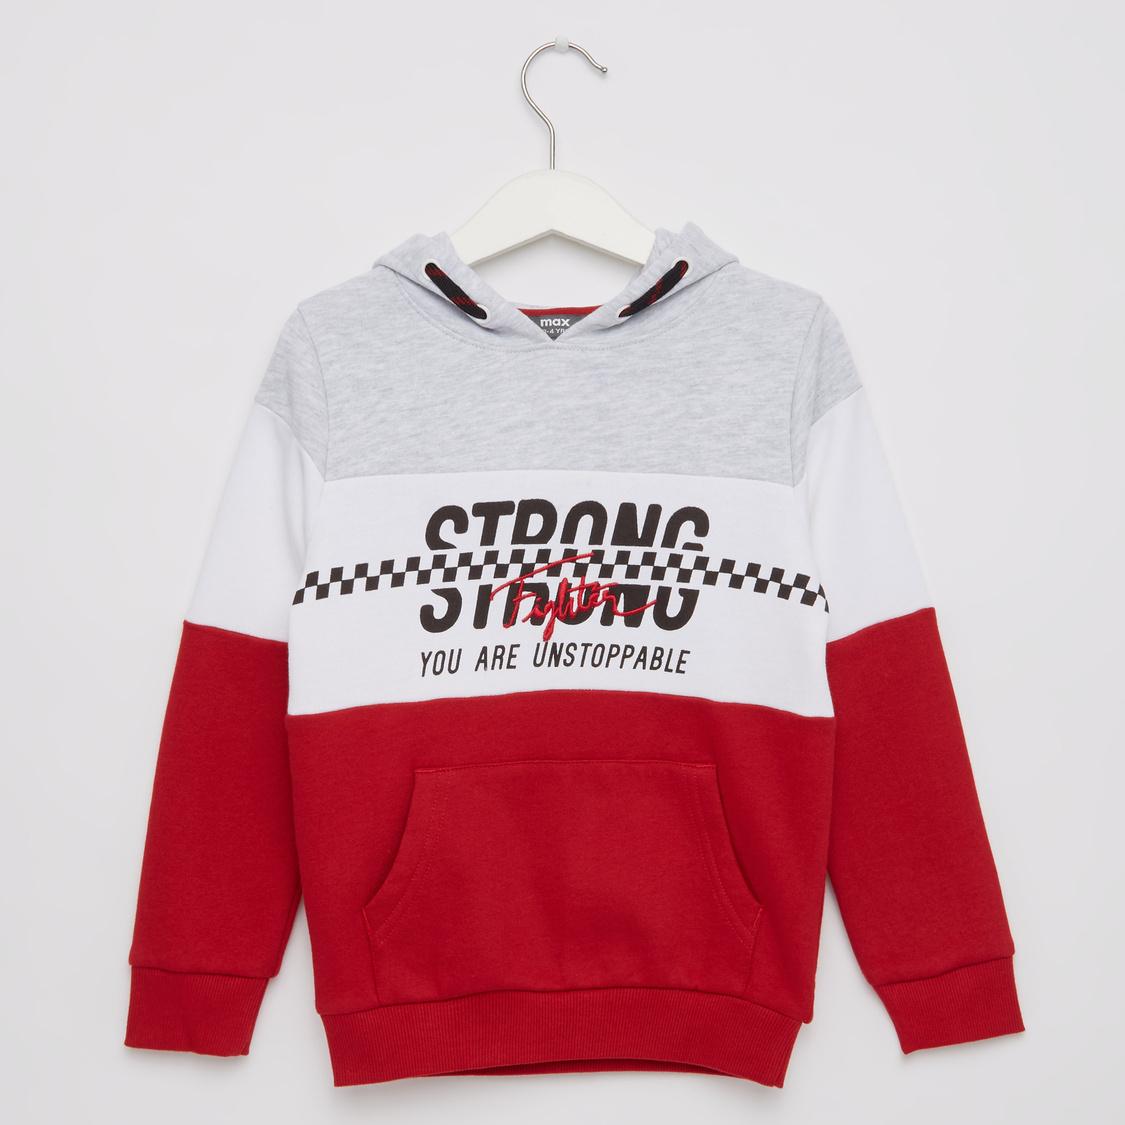 Printed Sweatshirt with Long Sleeves and Hood